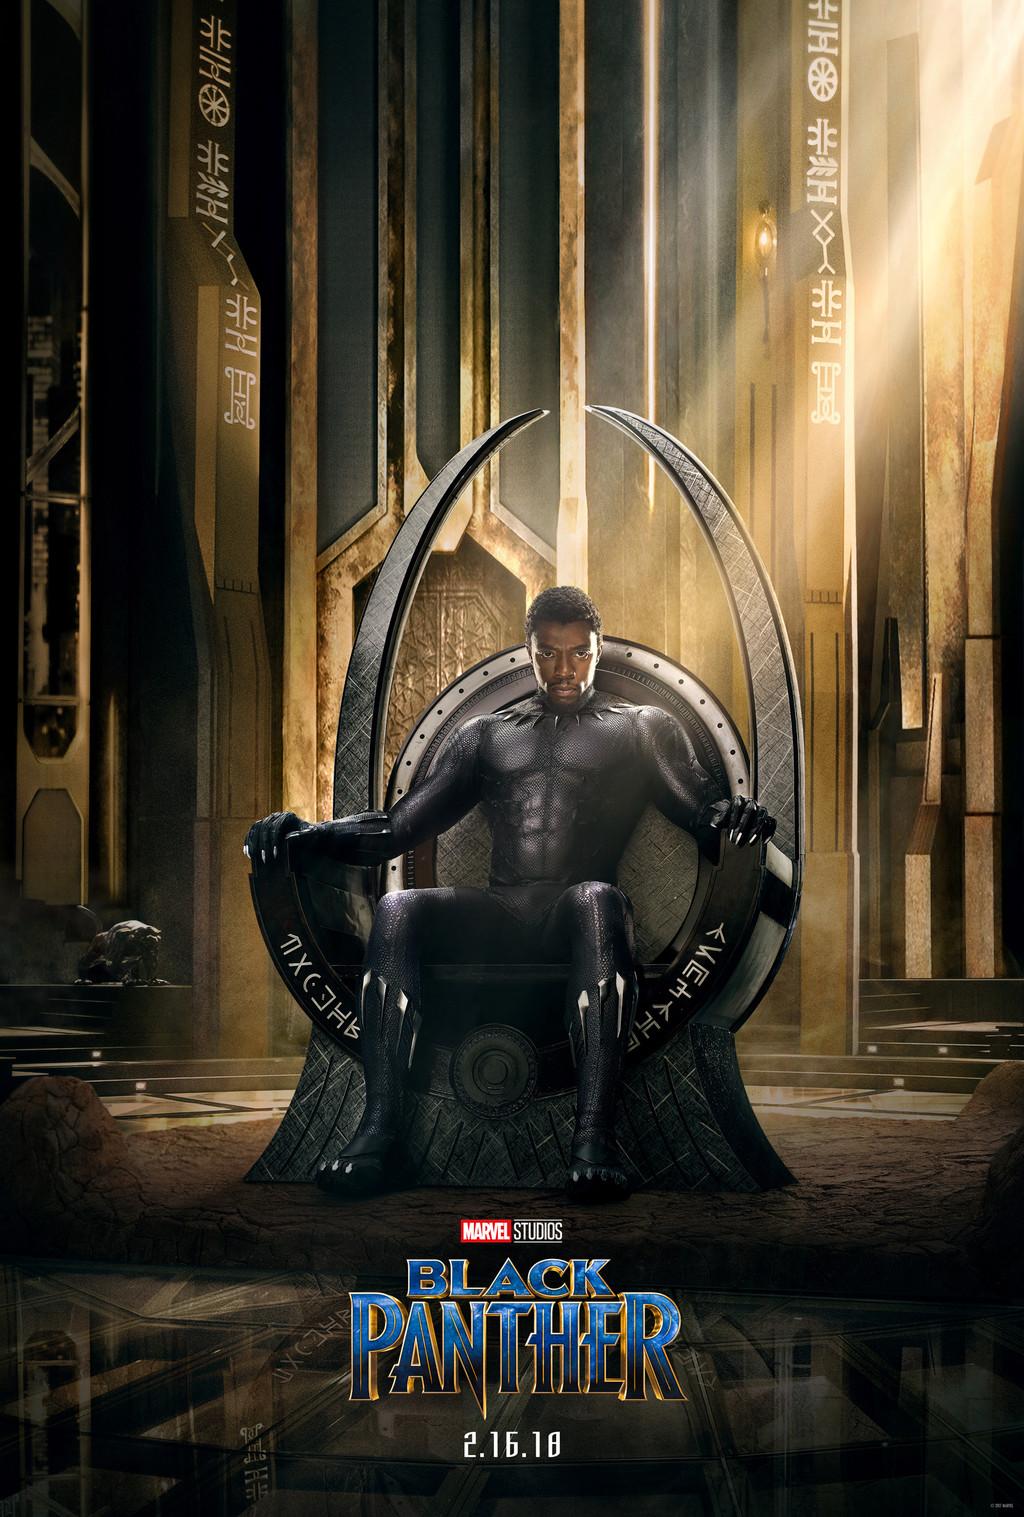 El póster de Black Panther